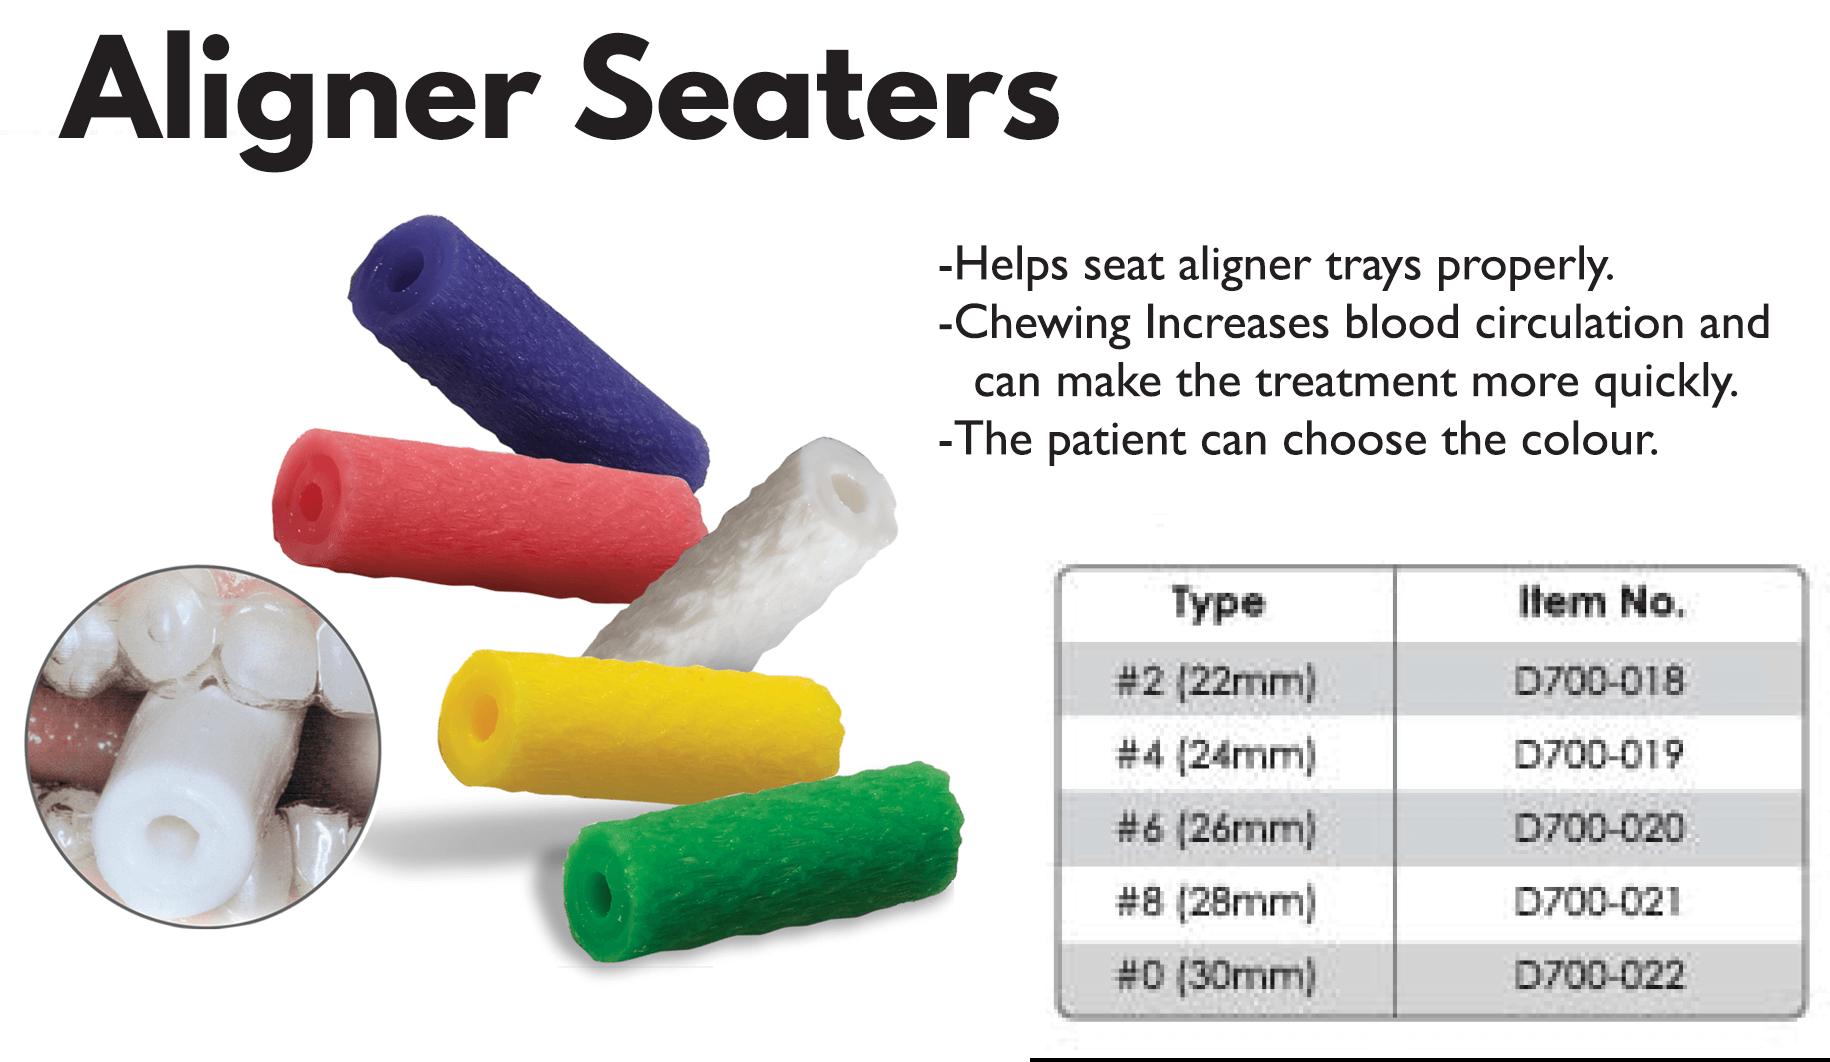 Aligner Seaters